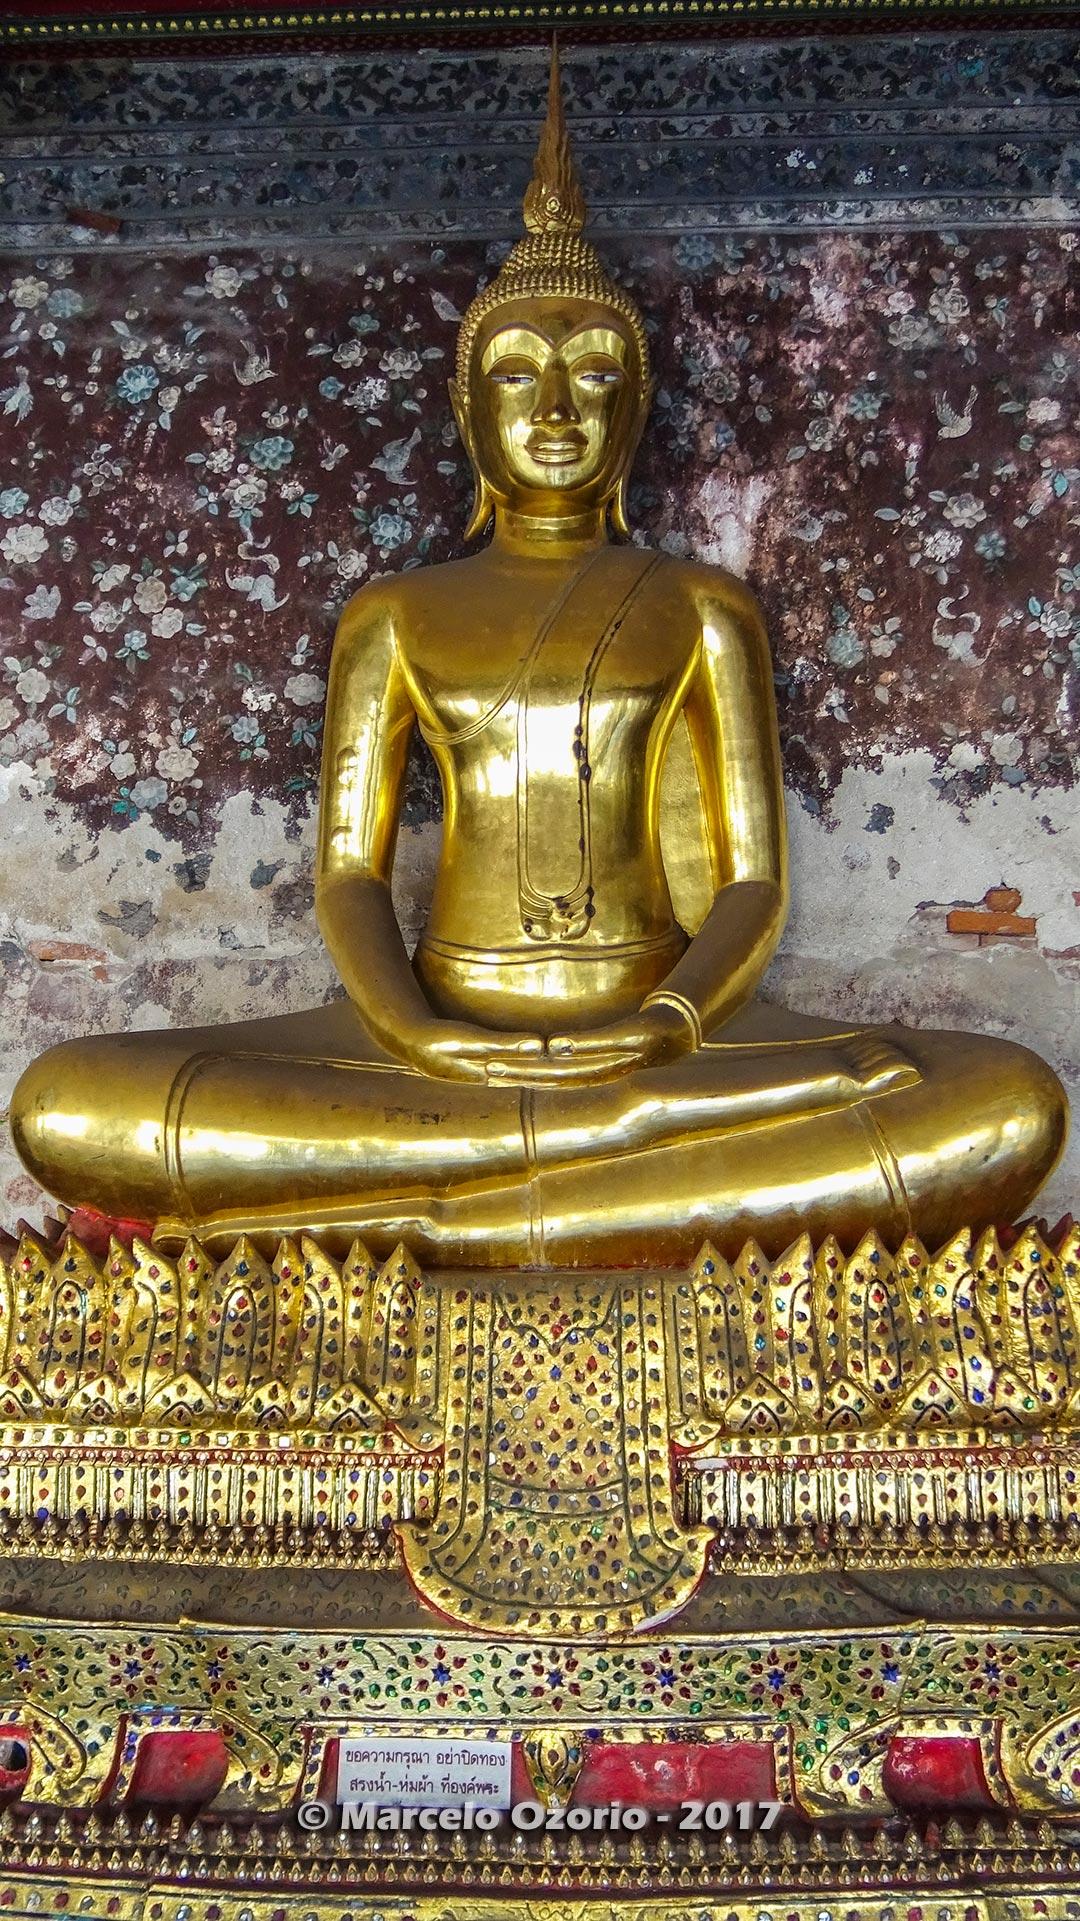 budhas bangkok thailand serie 2 - Buddhas of Bangkok - Thailand